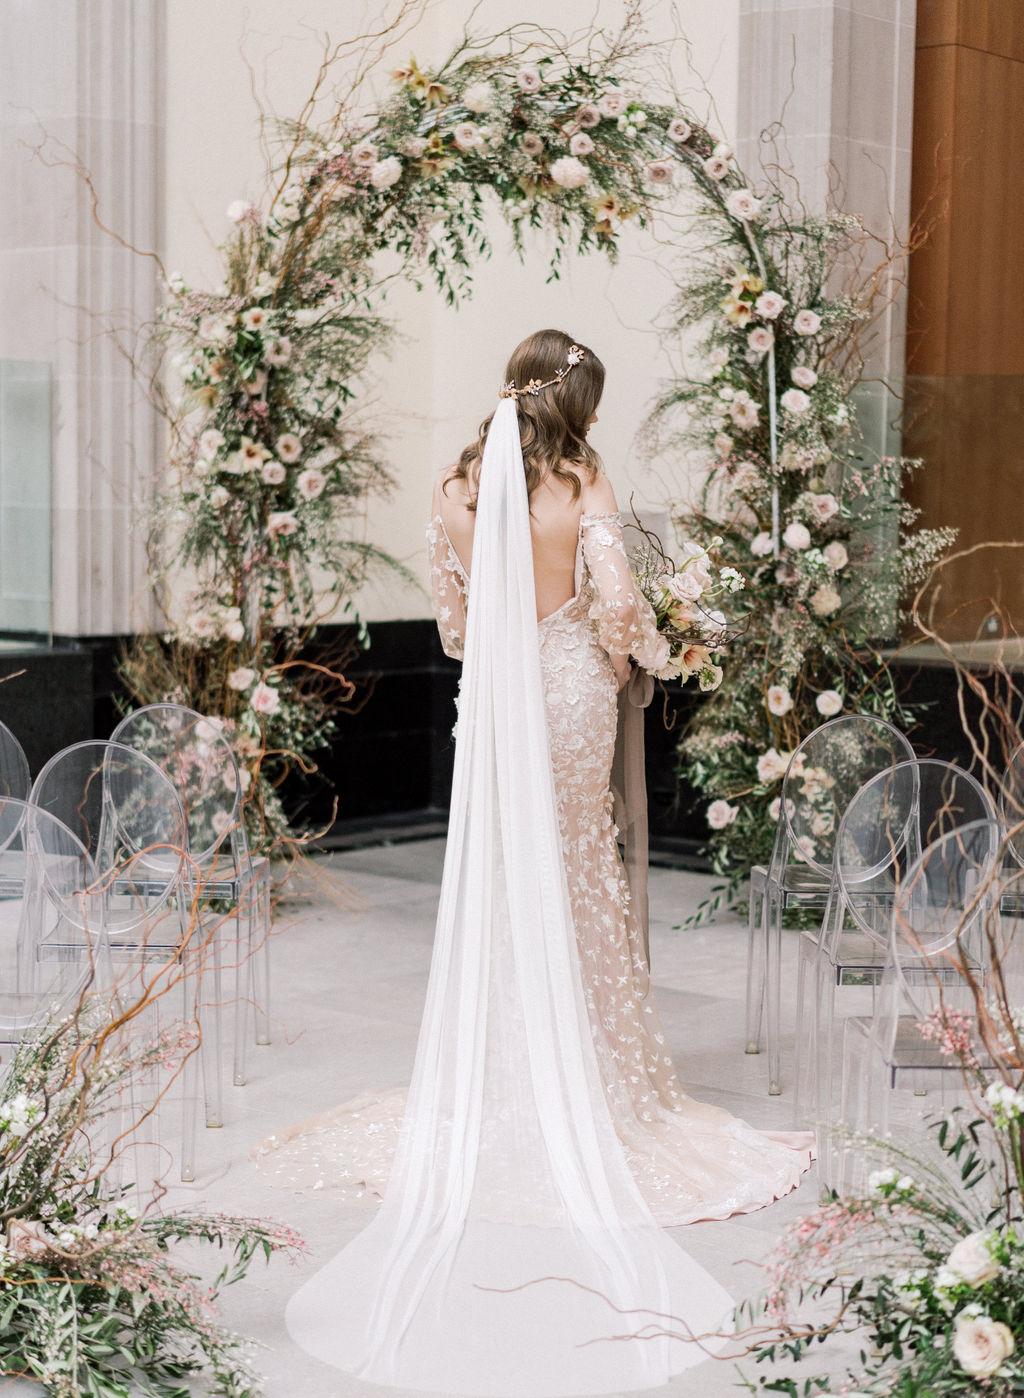 artiese-ago-wedding-editorial-06744.jpg